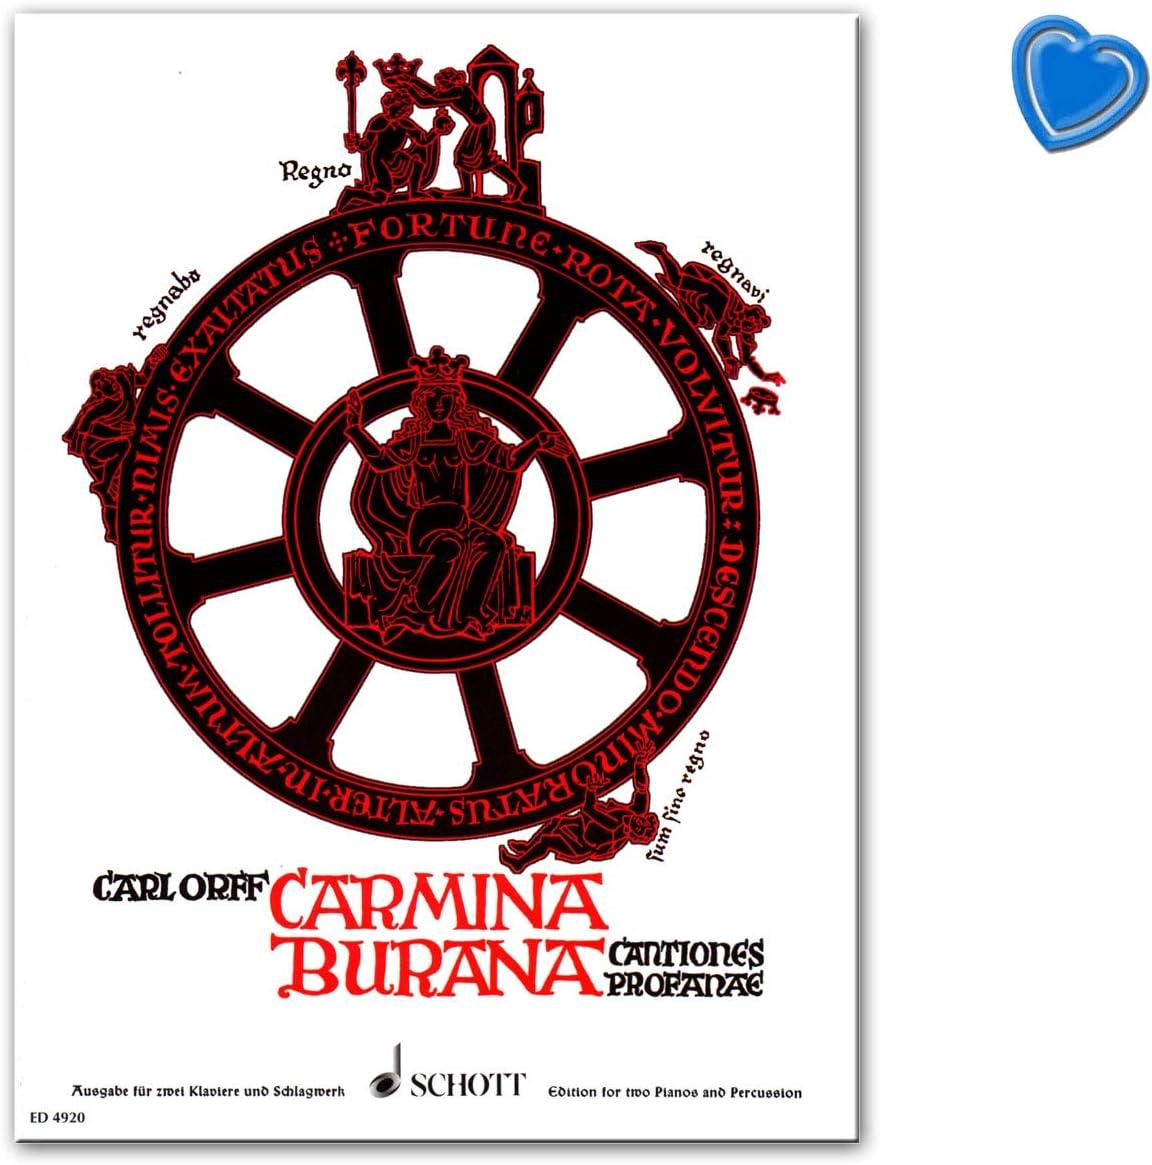 Carmina burana Cant iones profanae Carl Orff – Verlag Schott ...